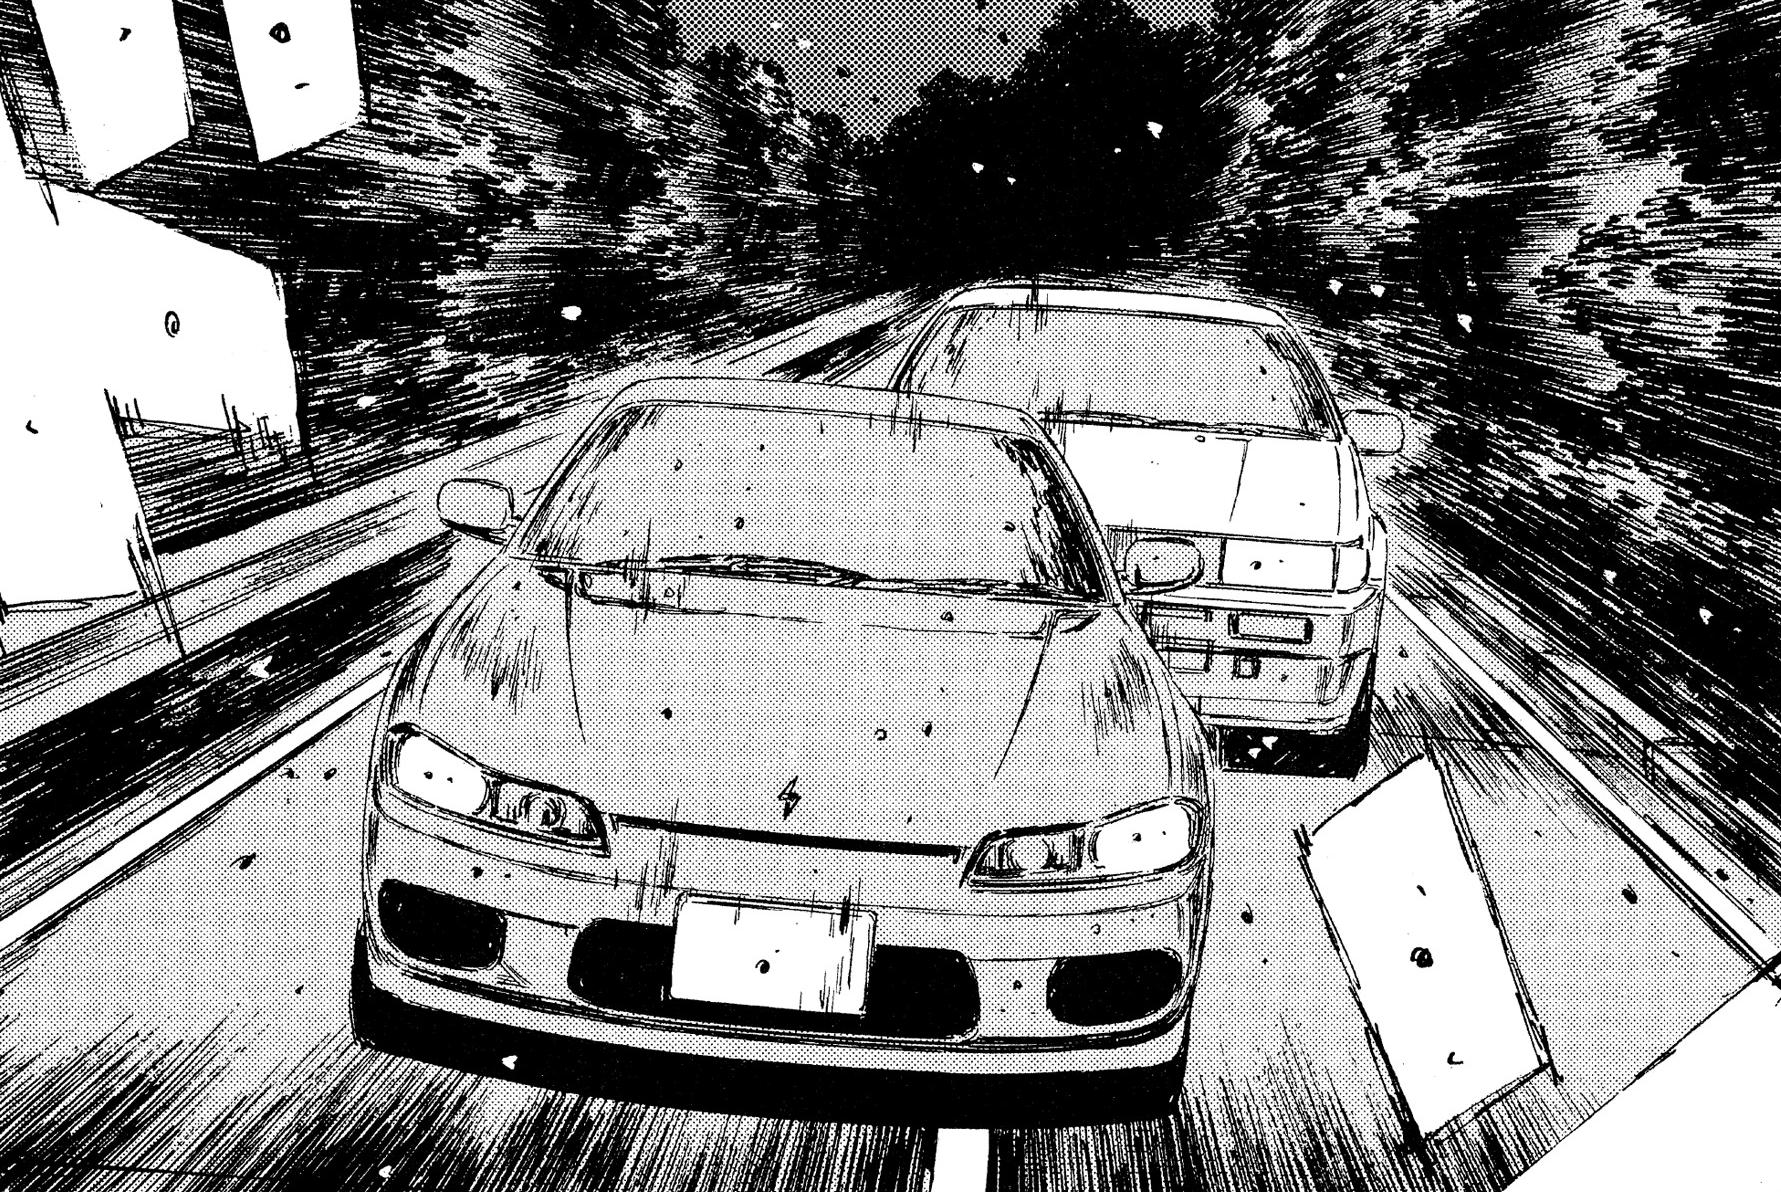 Takumi Fujiwara vs the Two Guys From Tokyo